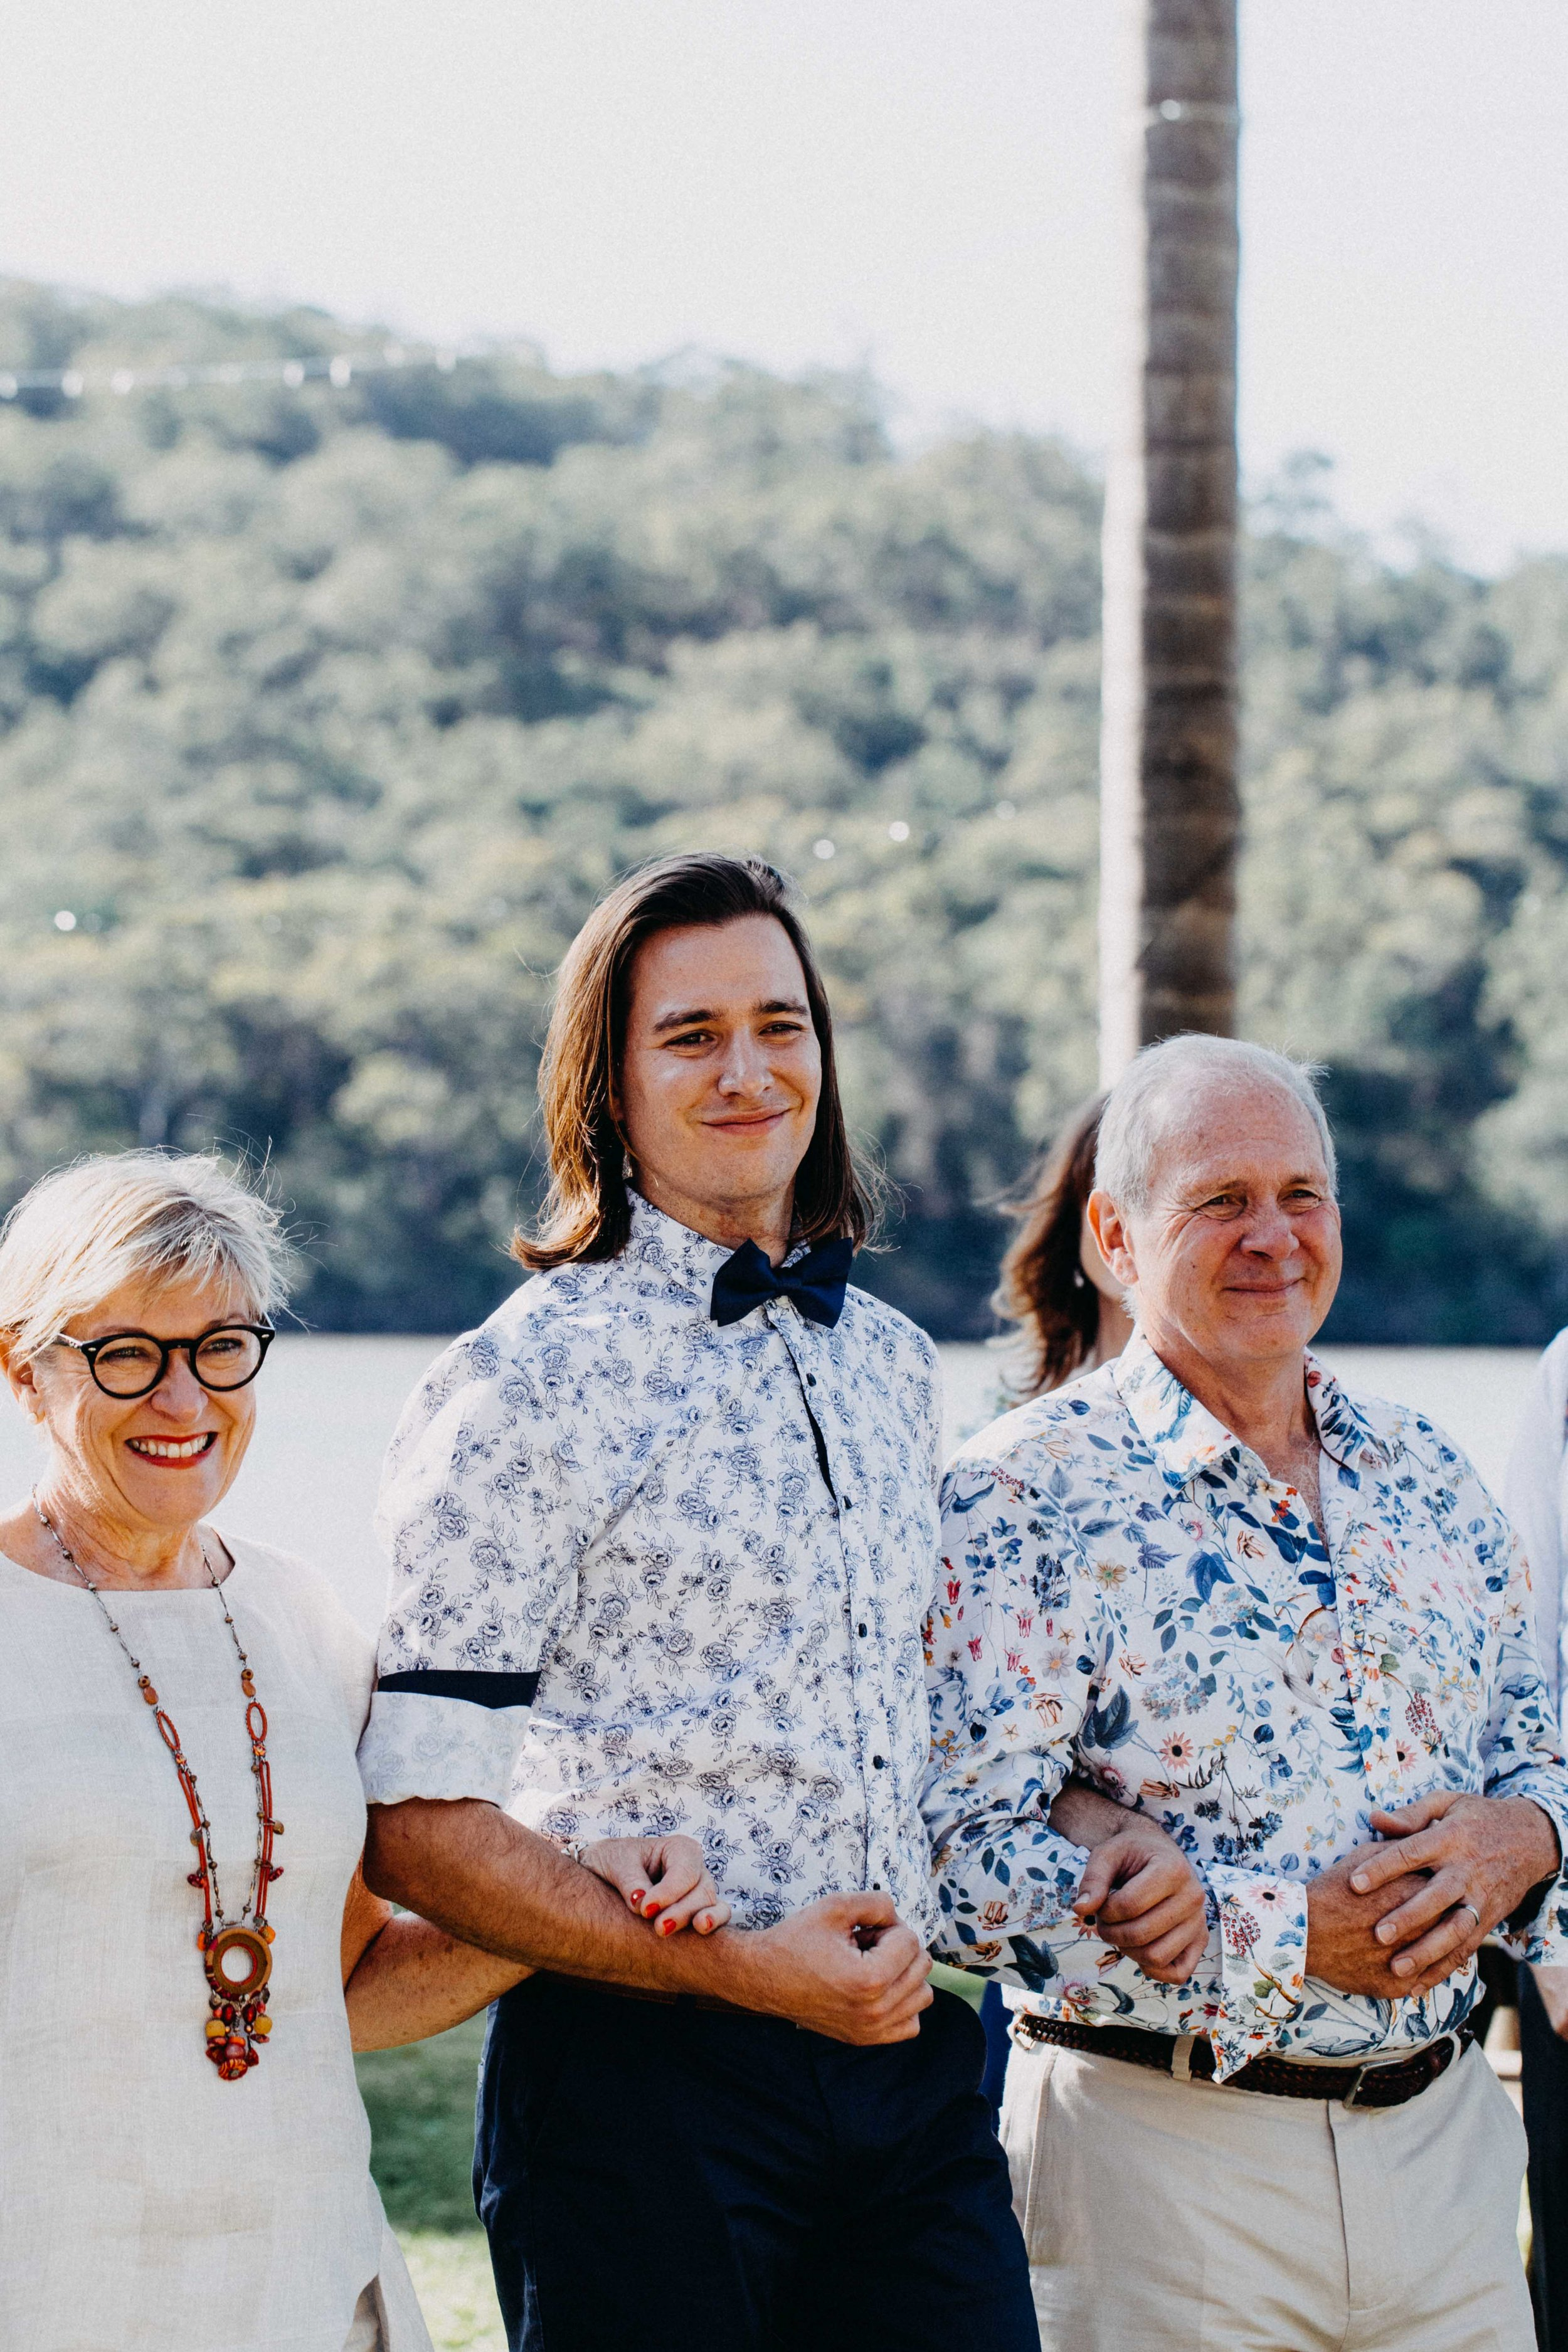 wisemans-ferry-wedding-www.emilyobrienphotography.net-54.jpg